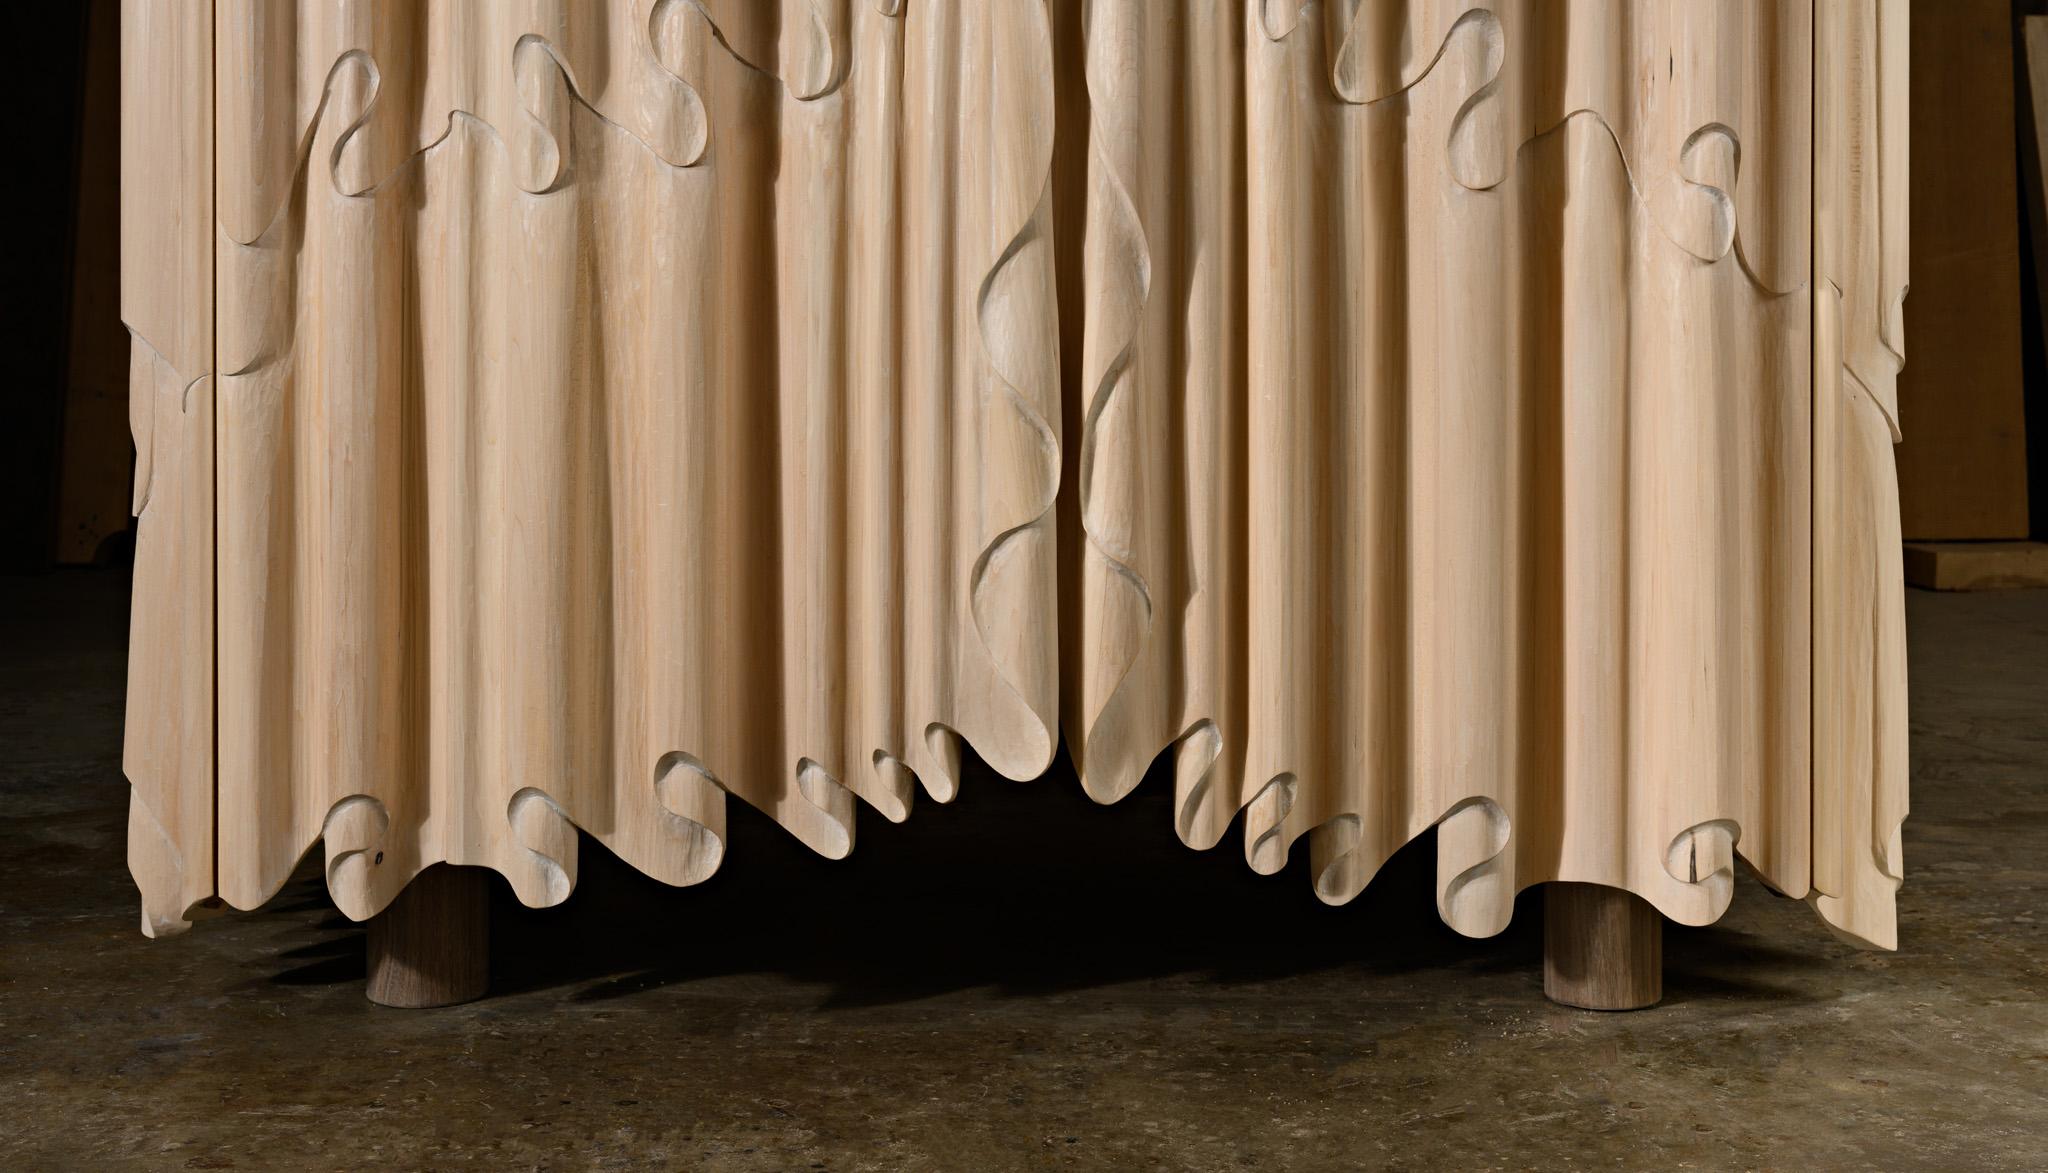 bottom edge detail of Linenfold Armoire (Perpendicular Style) by artist Christopher Kurtz